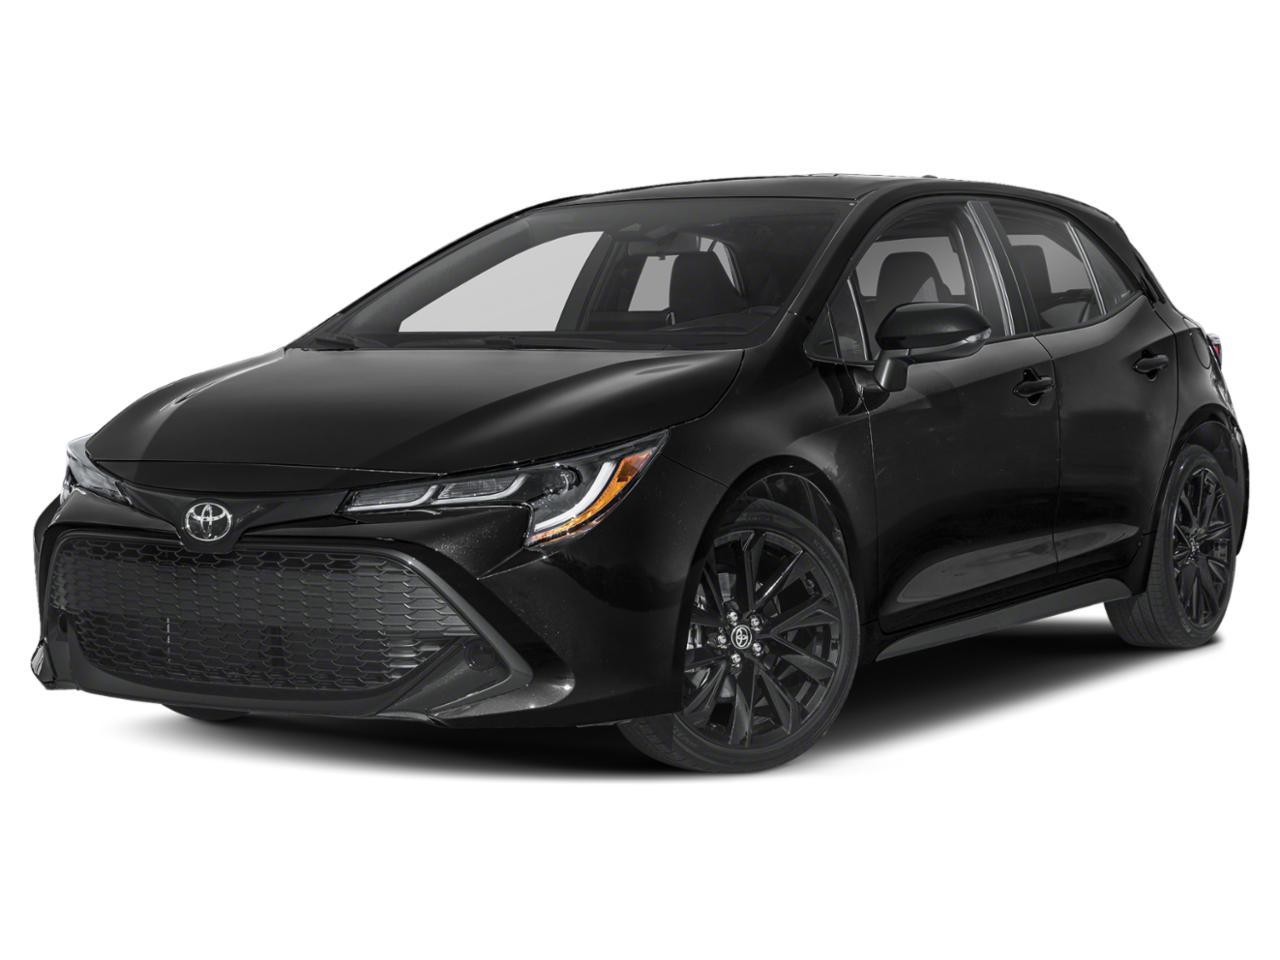 2020 Toyota Corolla Hatchback Vehicle Photo in San Antonio, TX 78238